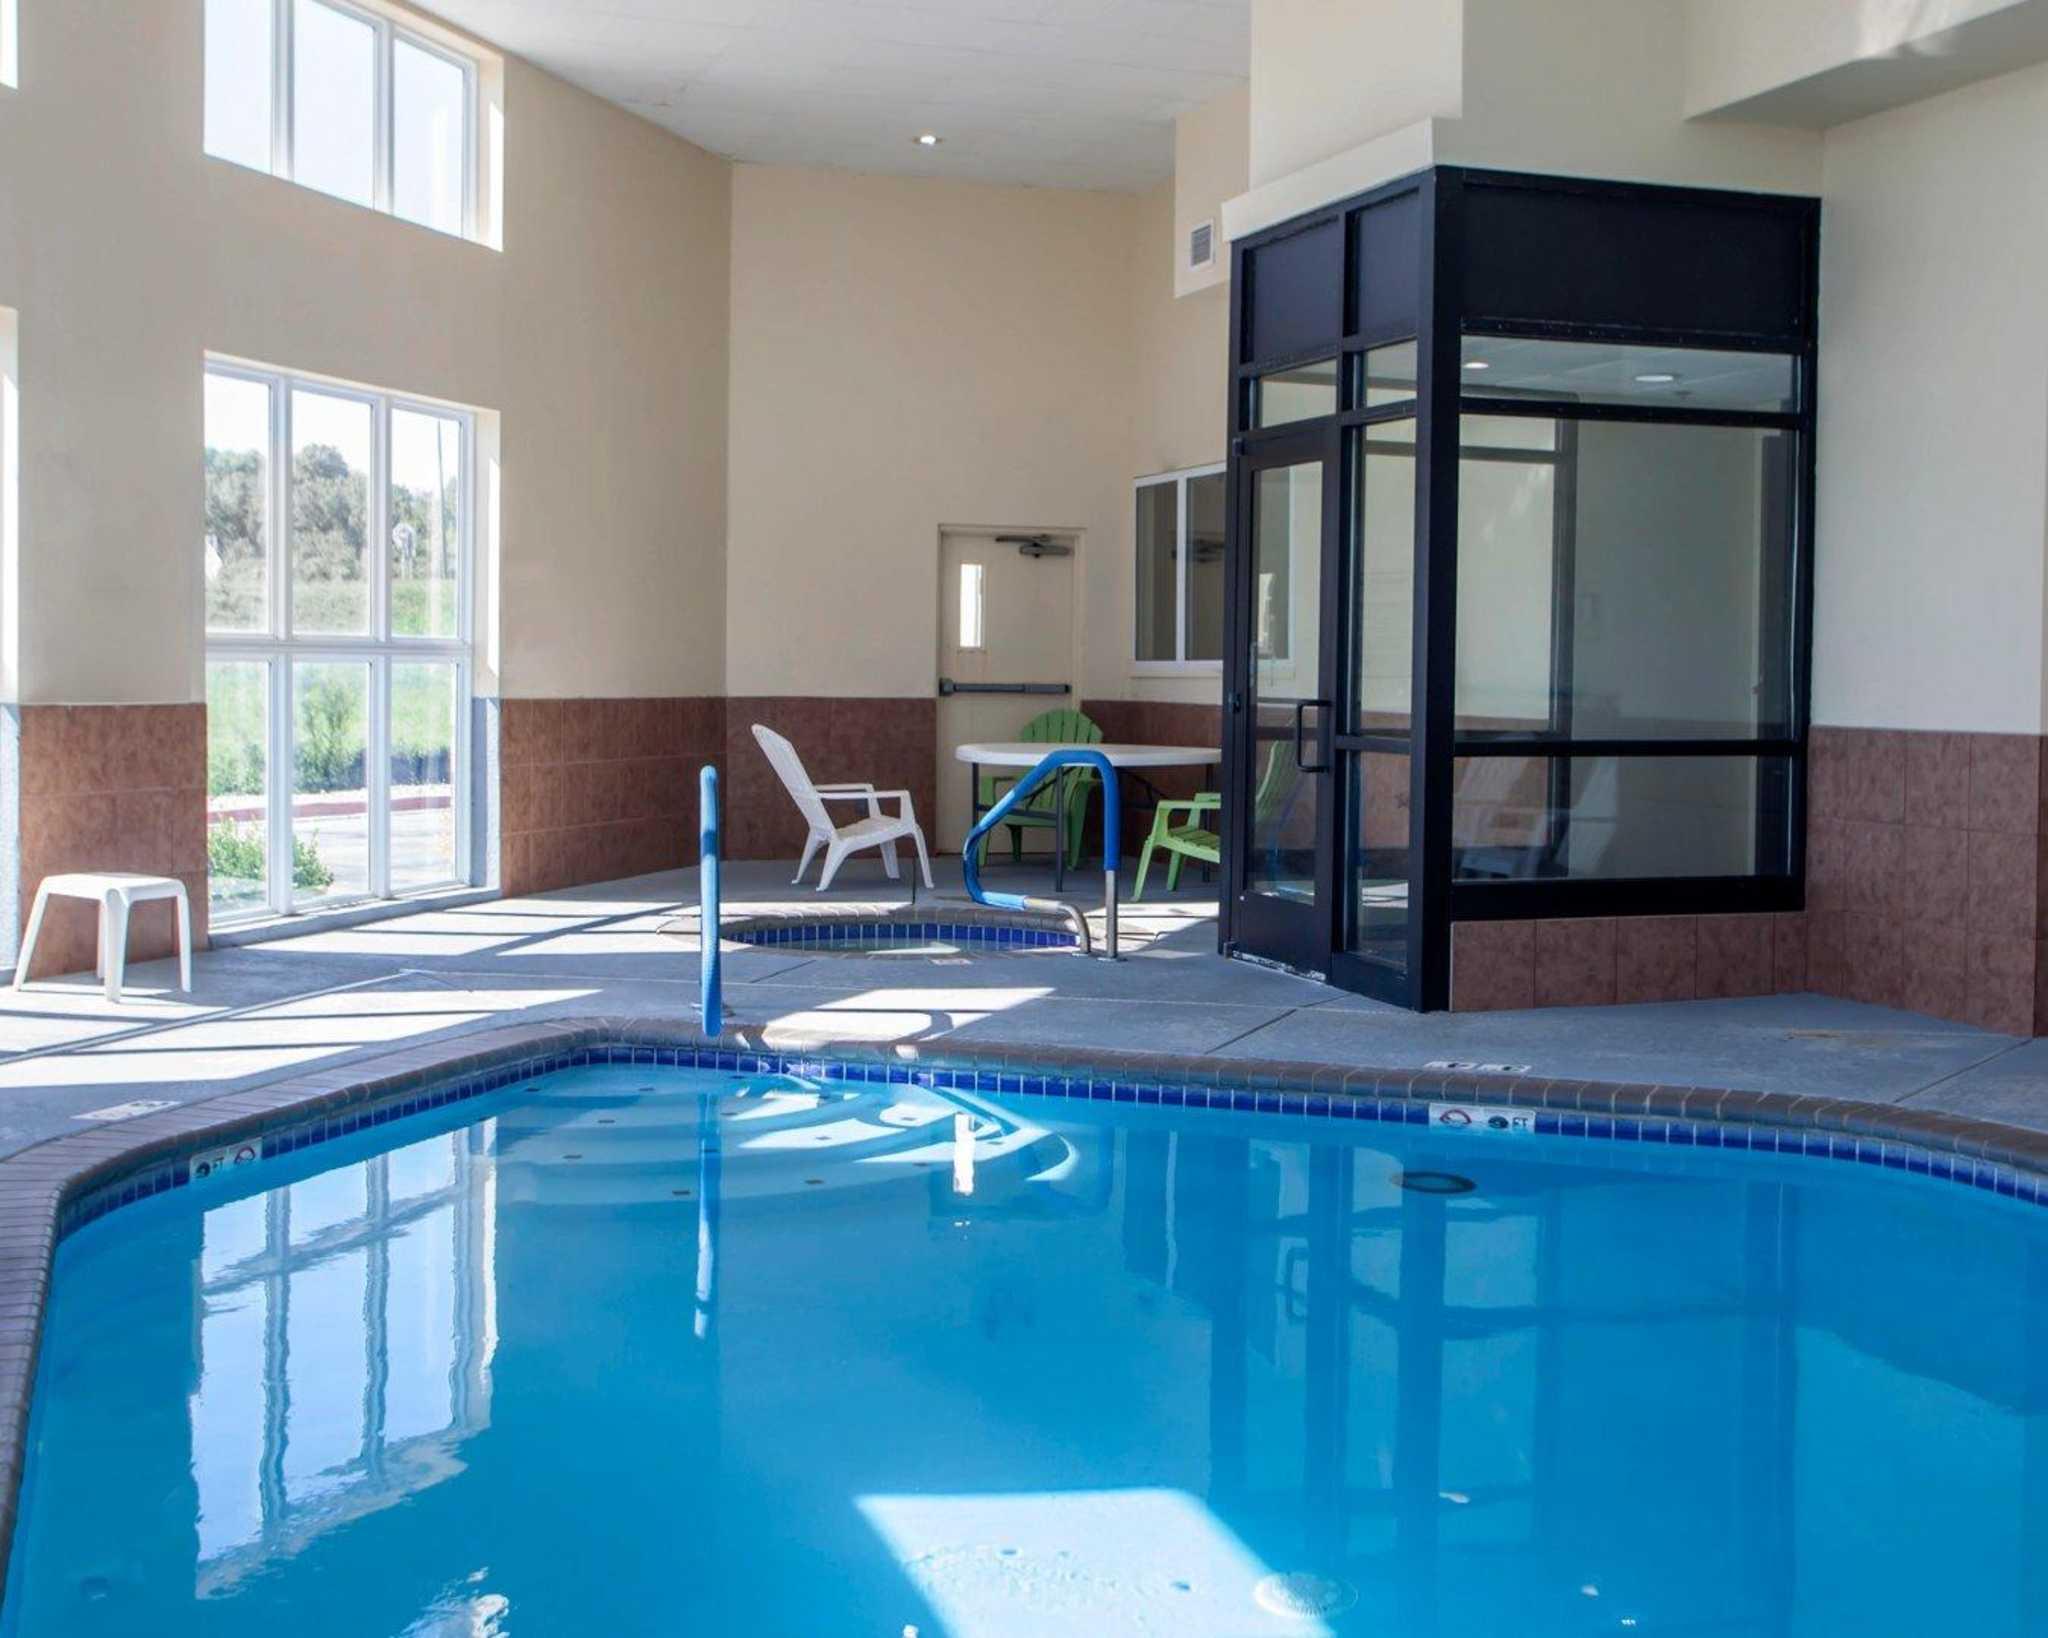 Comfort Inn & Suites image 20